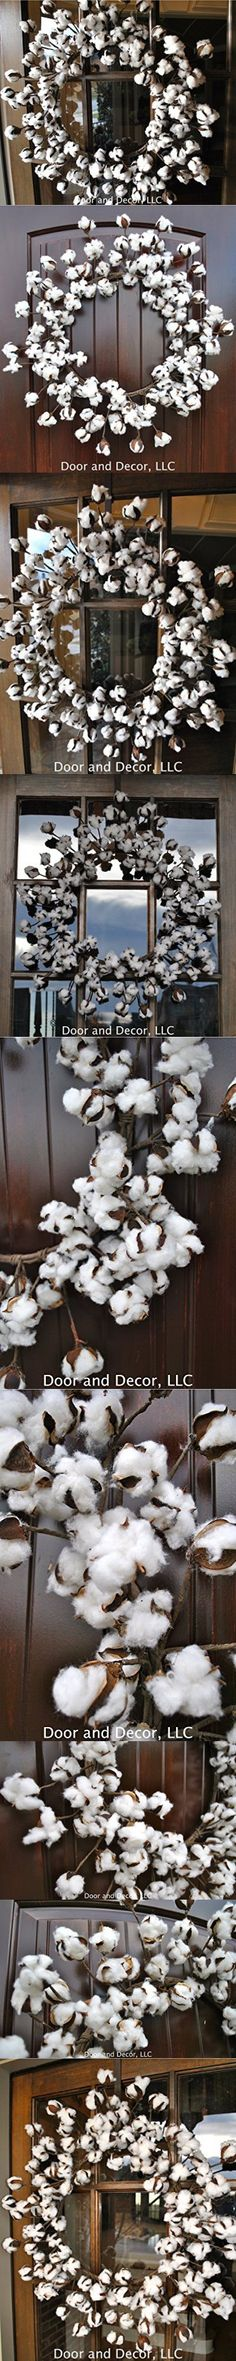 "Cotton wreath~cotton boll wreath~Fixer Upper~26"" cotton wreath~cotton decor~rustic wreath~rustic wedding wreath~farmhouse wreath~country decor~rustic farmhouse decor"